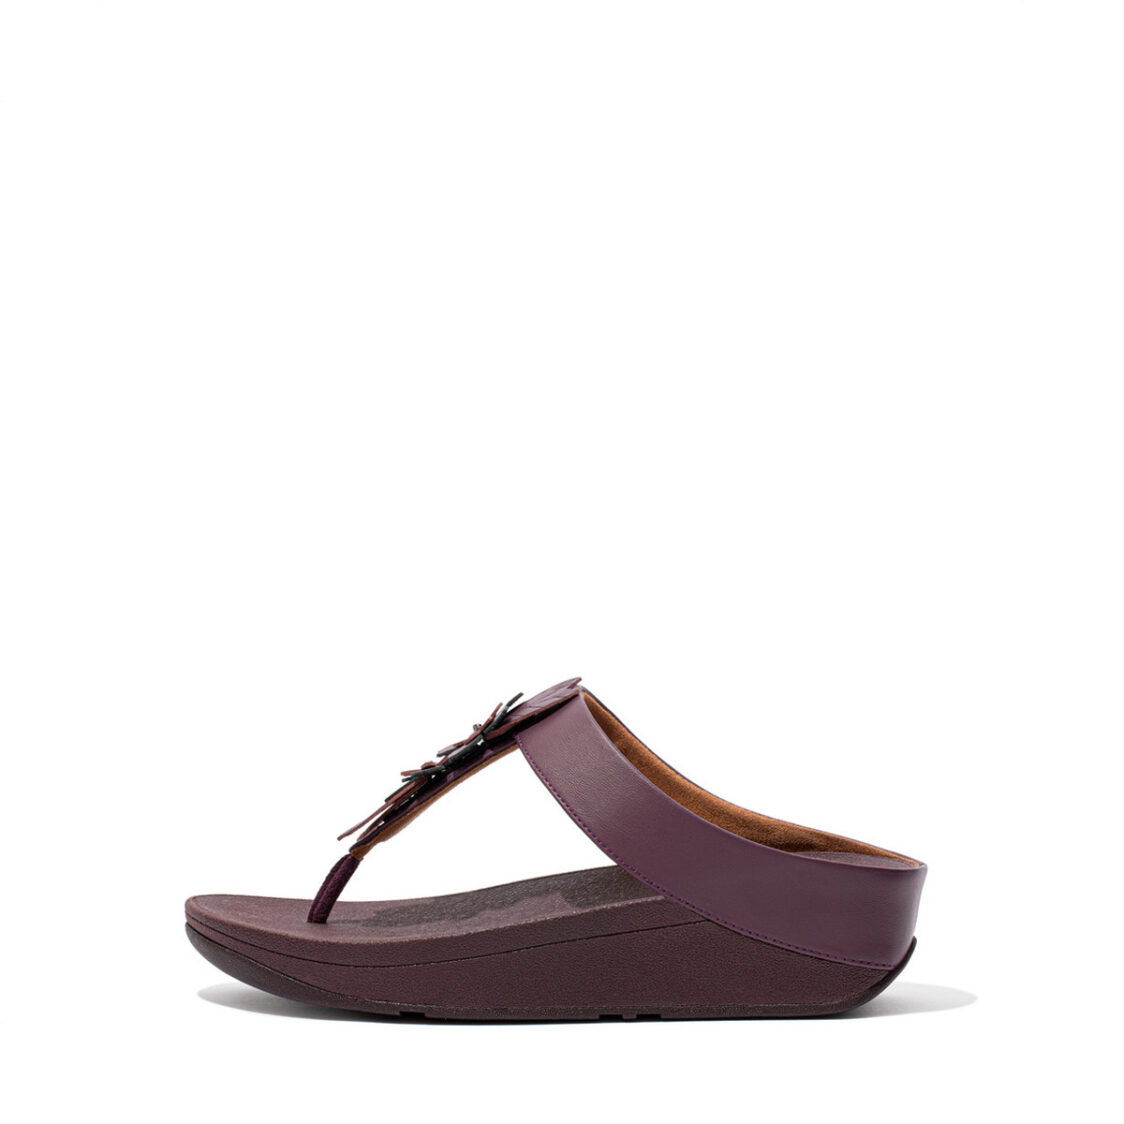 Fitflop Fino Floral Toe-Post Sandals Eggplant Purple Dz6-889